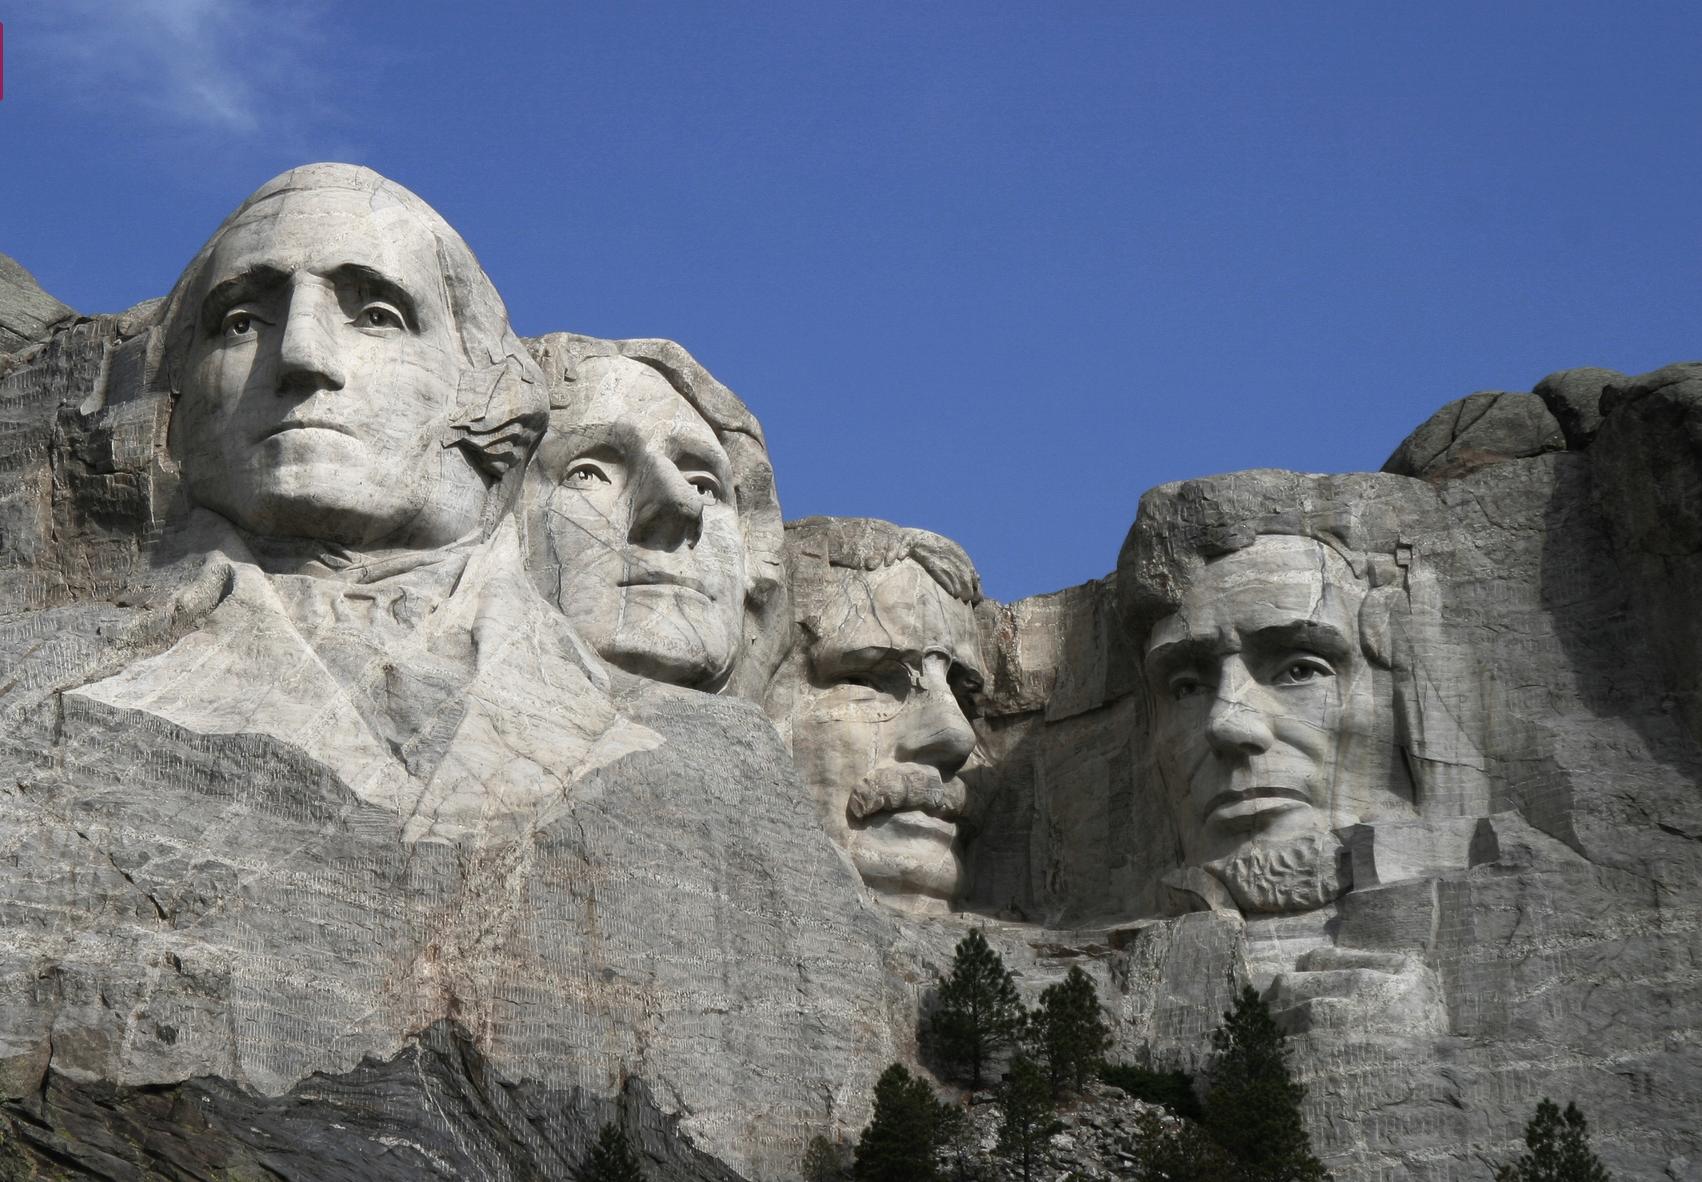 Washington Jefferson Roosevelt Lincoln By Guzton Borglum Mount Rushmore Black Hills Keystone Dunia